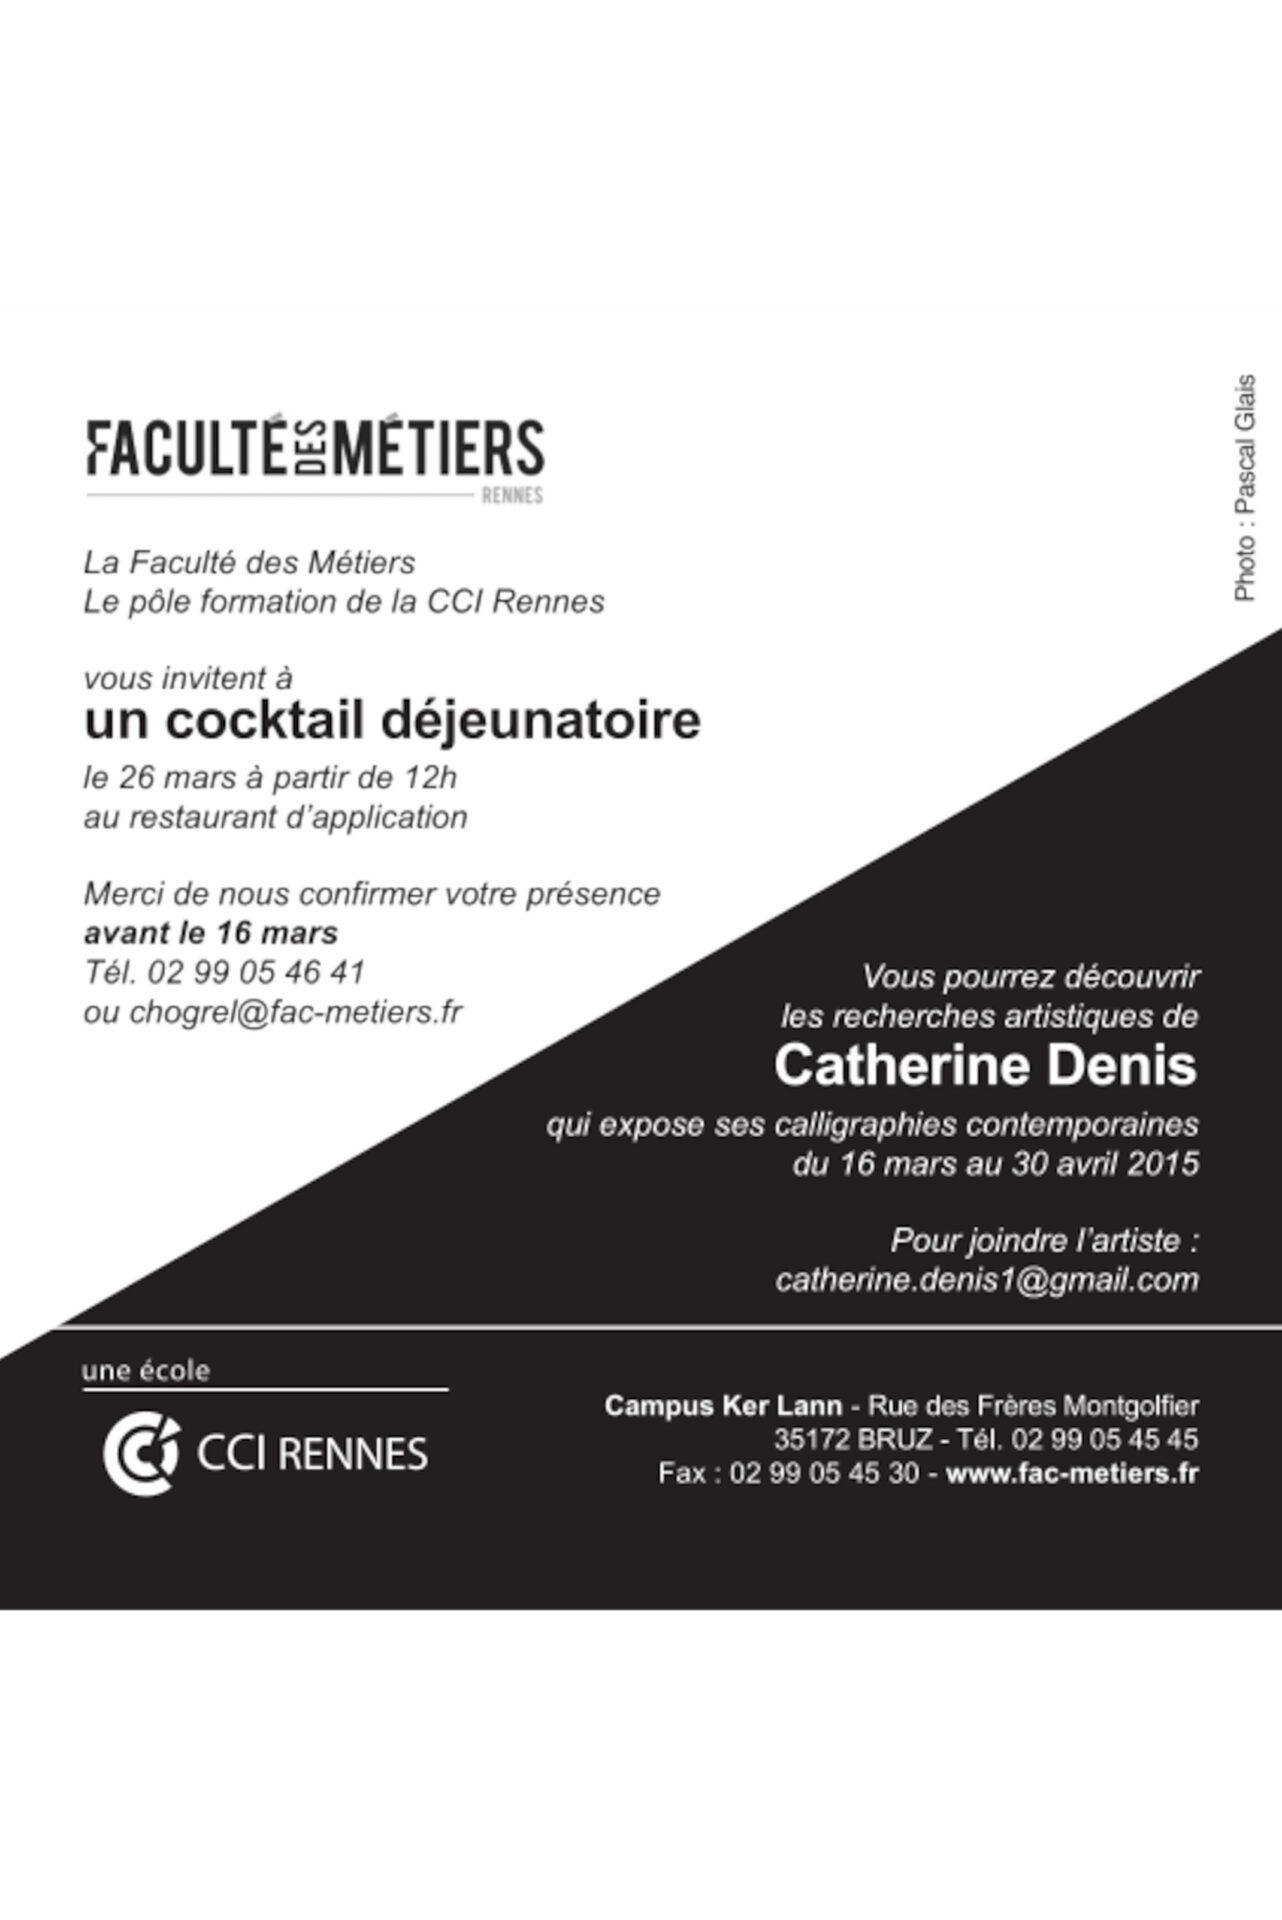 2015 - Université Kerlann, Rennes (35)